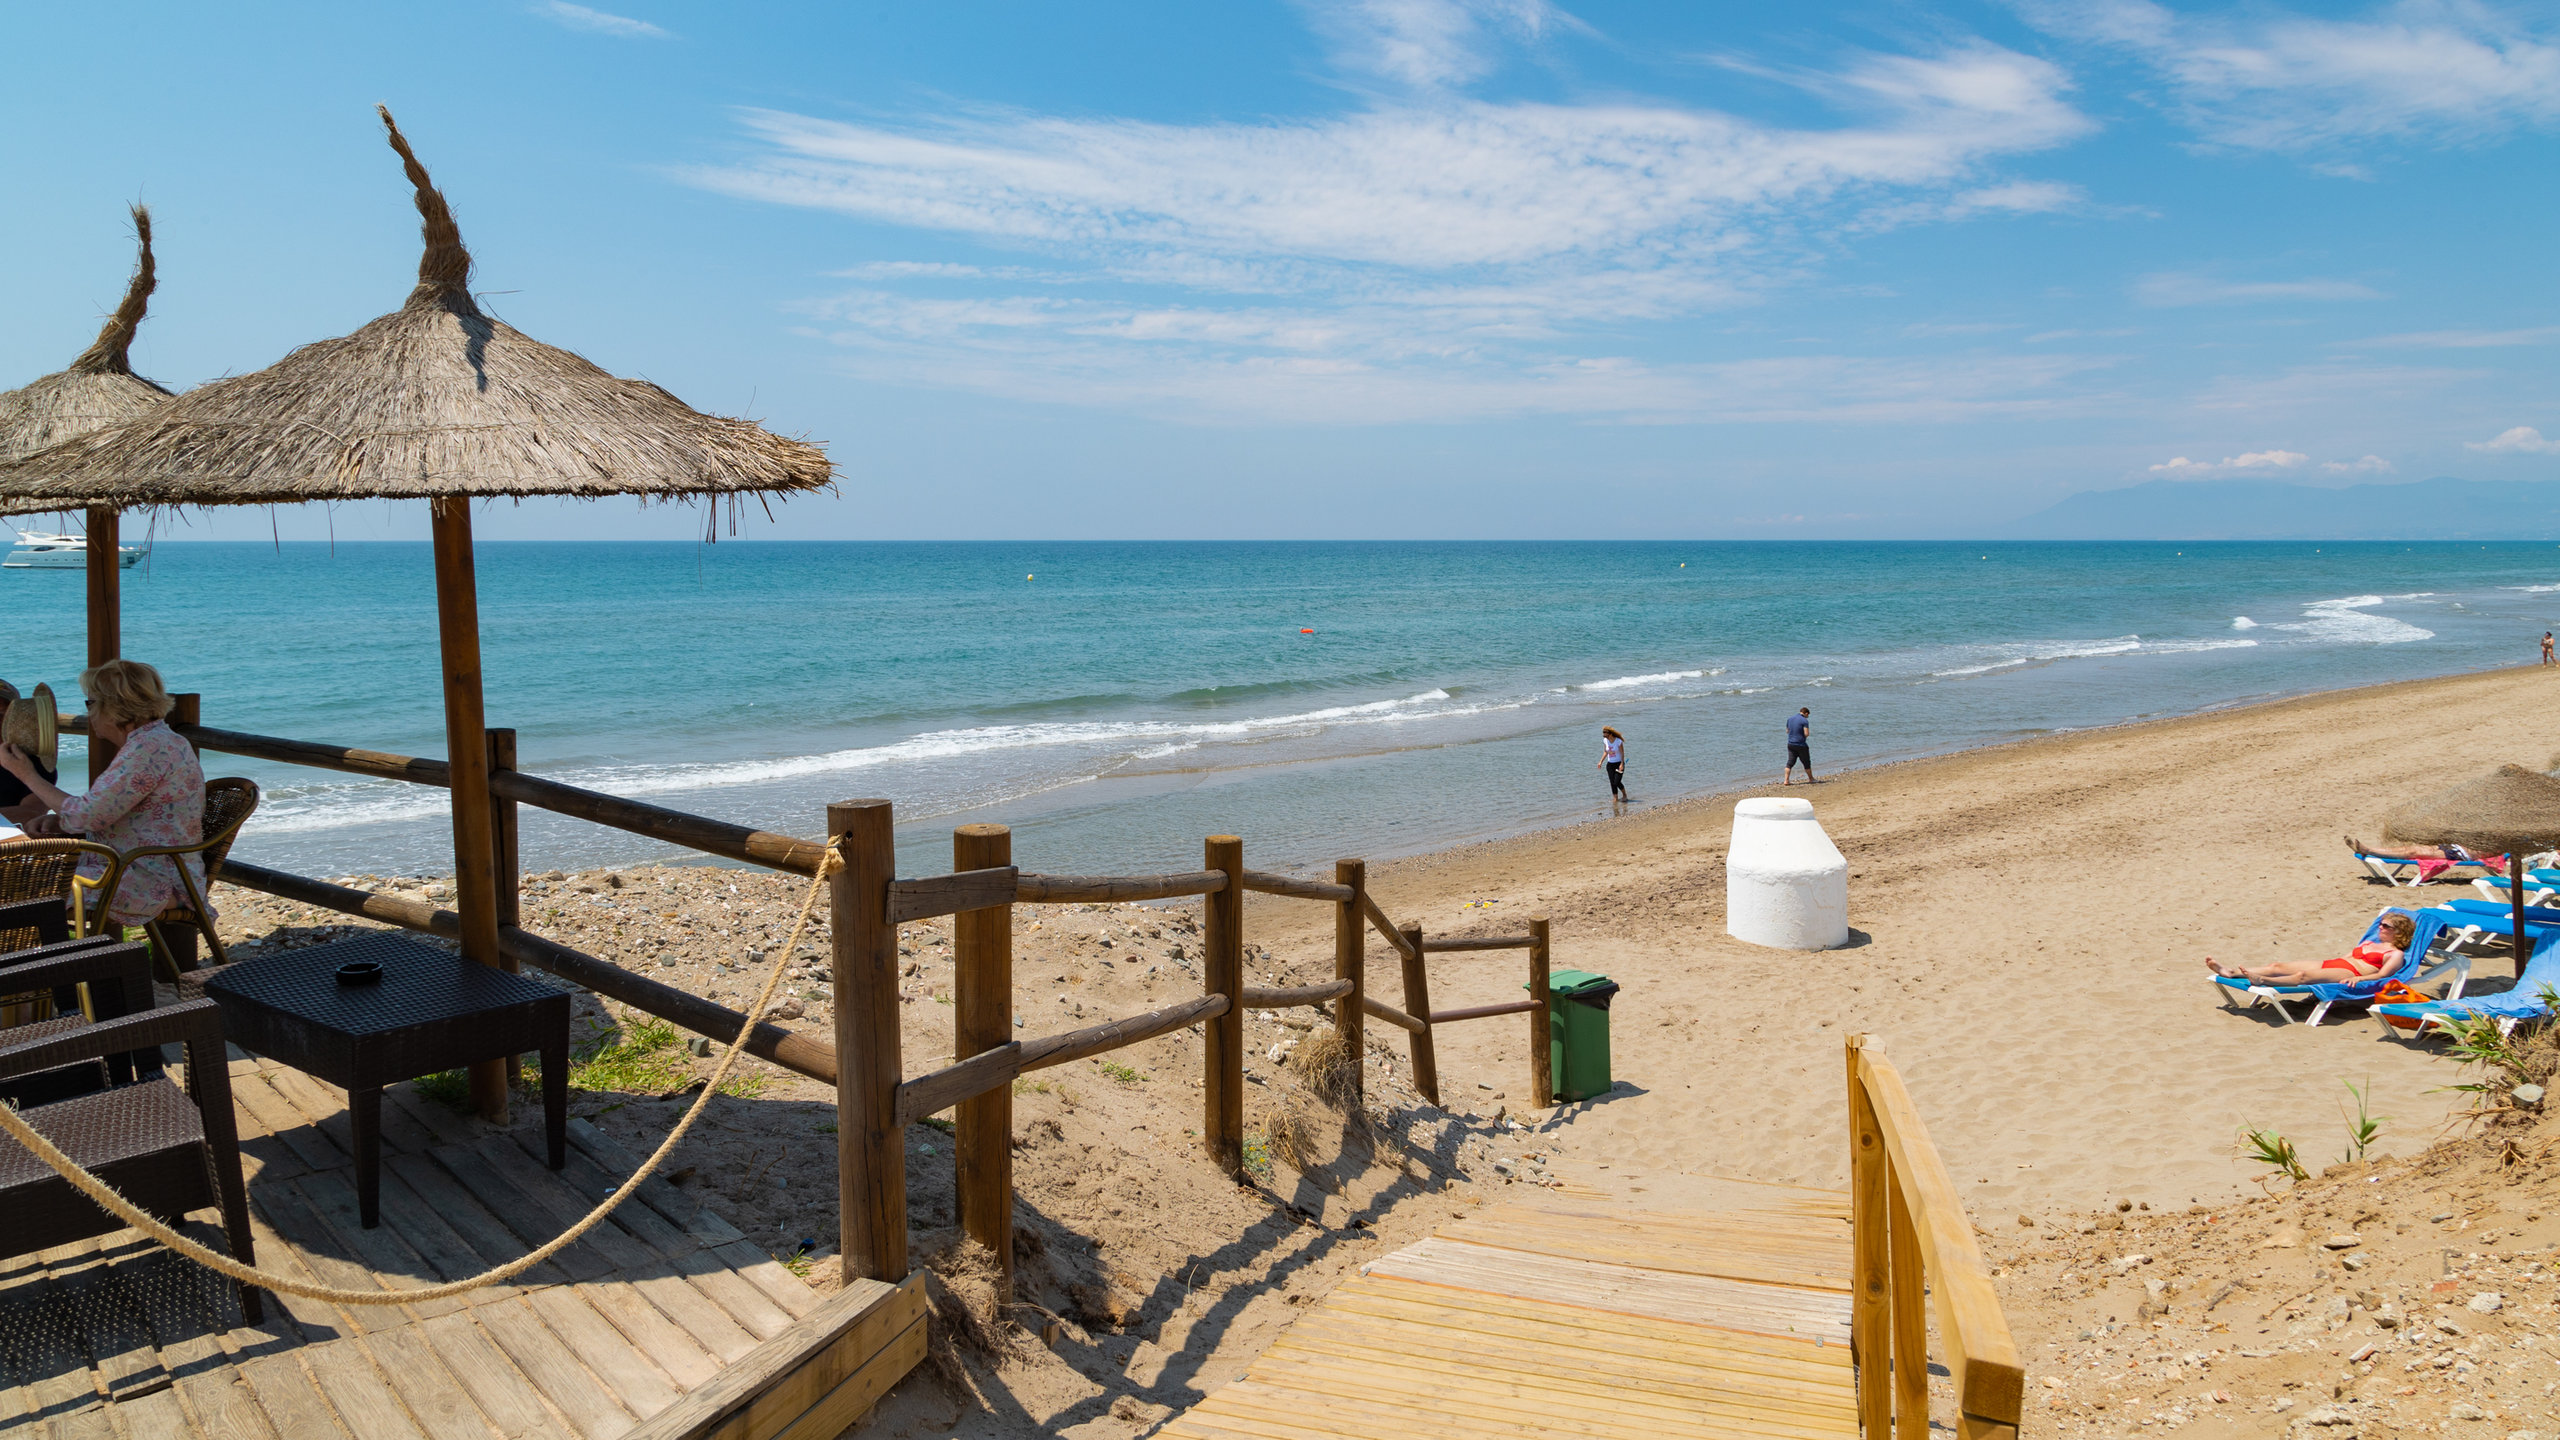 Nikki Beach, Marbella, Andalusia, Spain